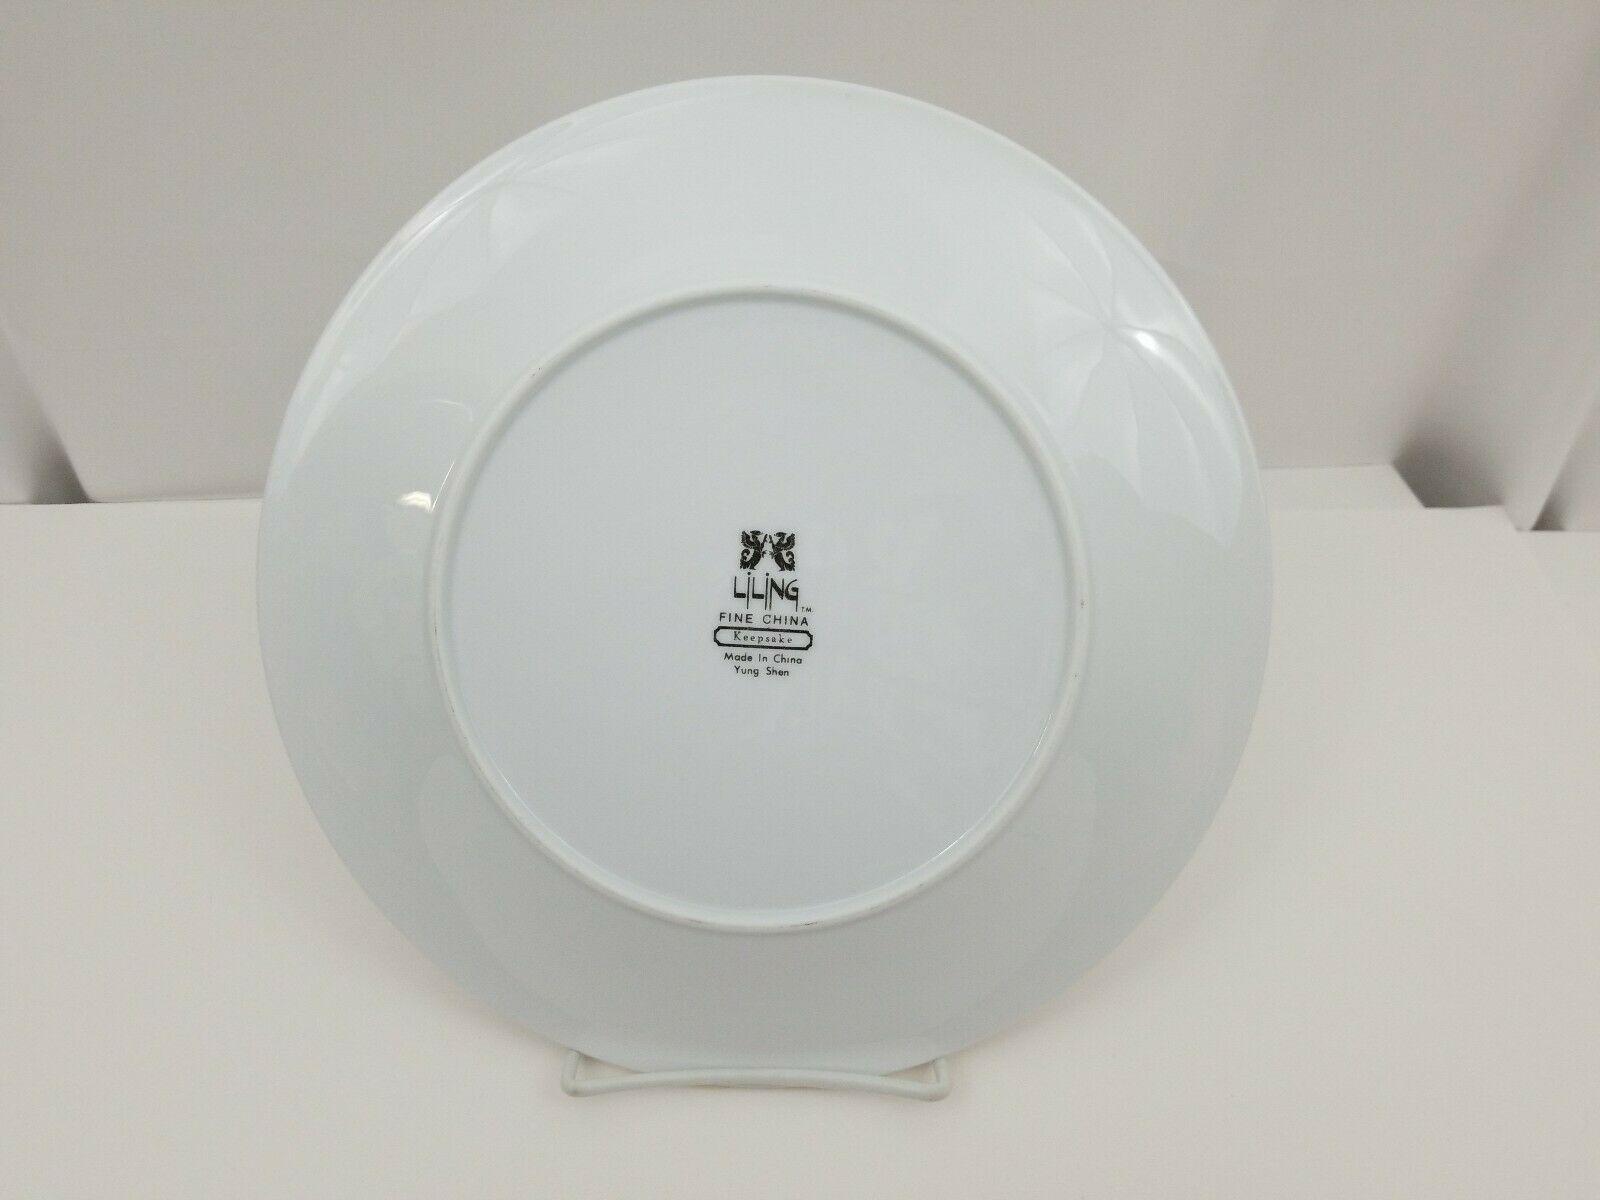 "Liling Fine China Dinner Plates Set of 4 Yung Shen White Roses Keepsake 10 5/8"" image 3"